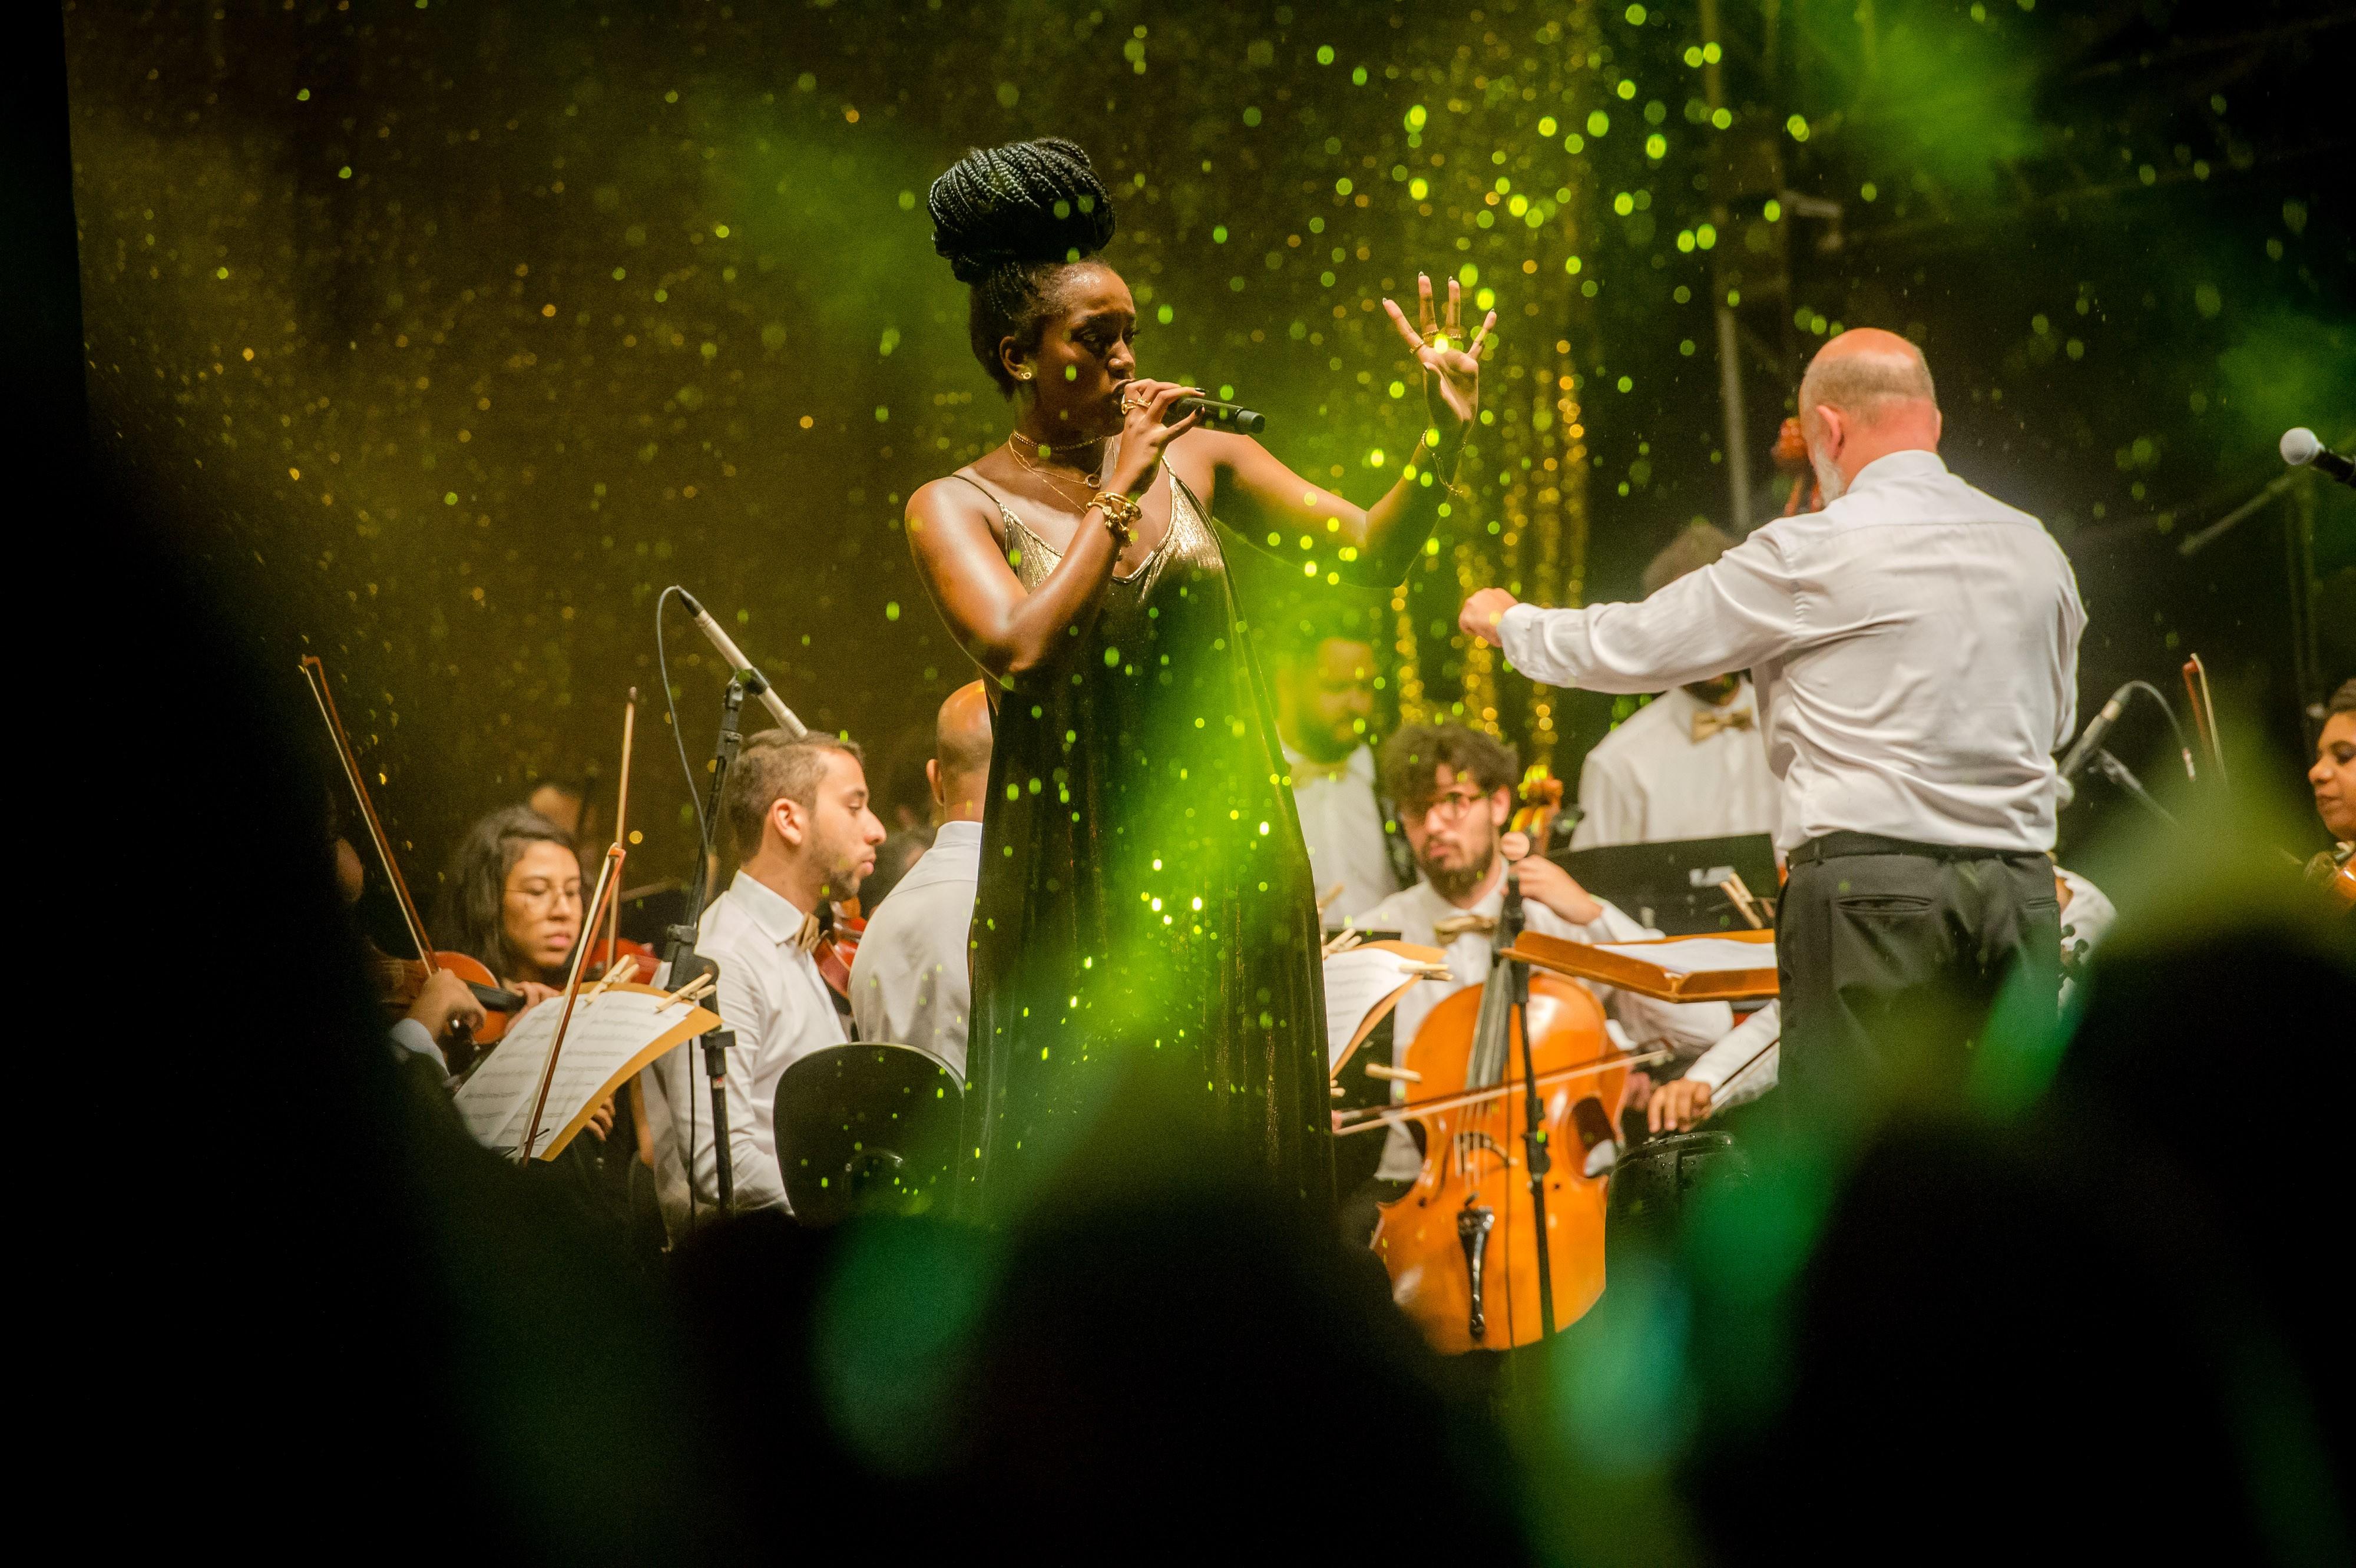 2018/03/14 - PANDORA SHOW IZAFoto: Gustavo Scatena / Imagem Paulista (Foto: Gustavo Scatena / Imagem Paulist)